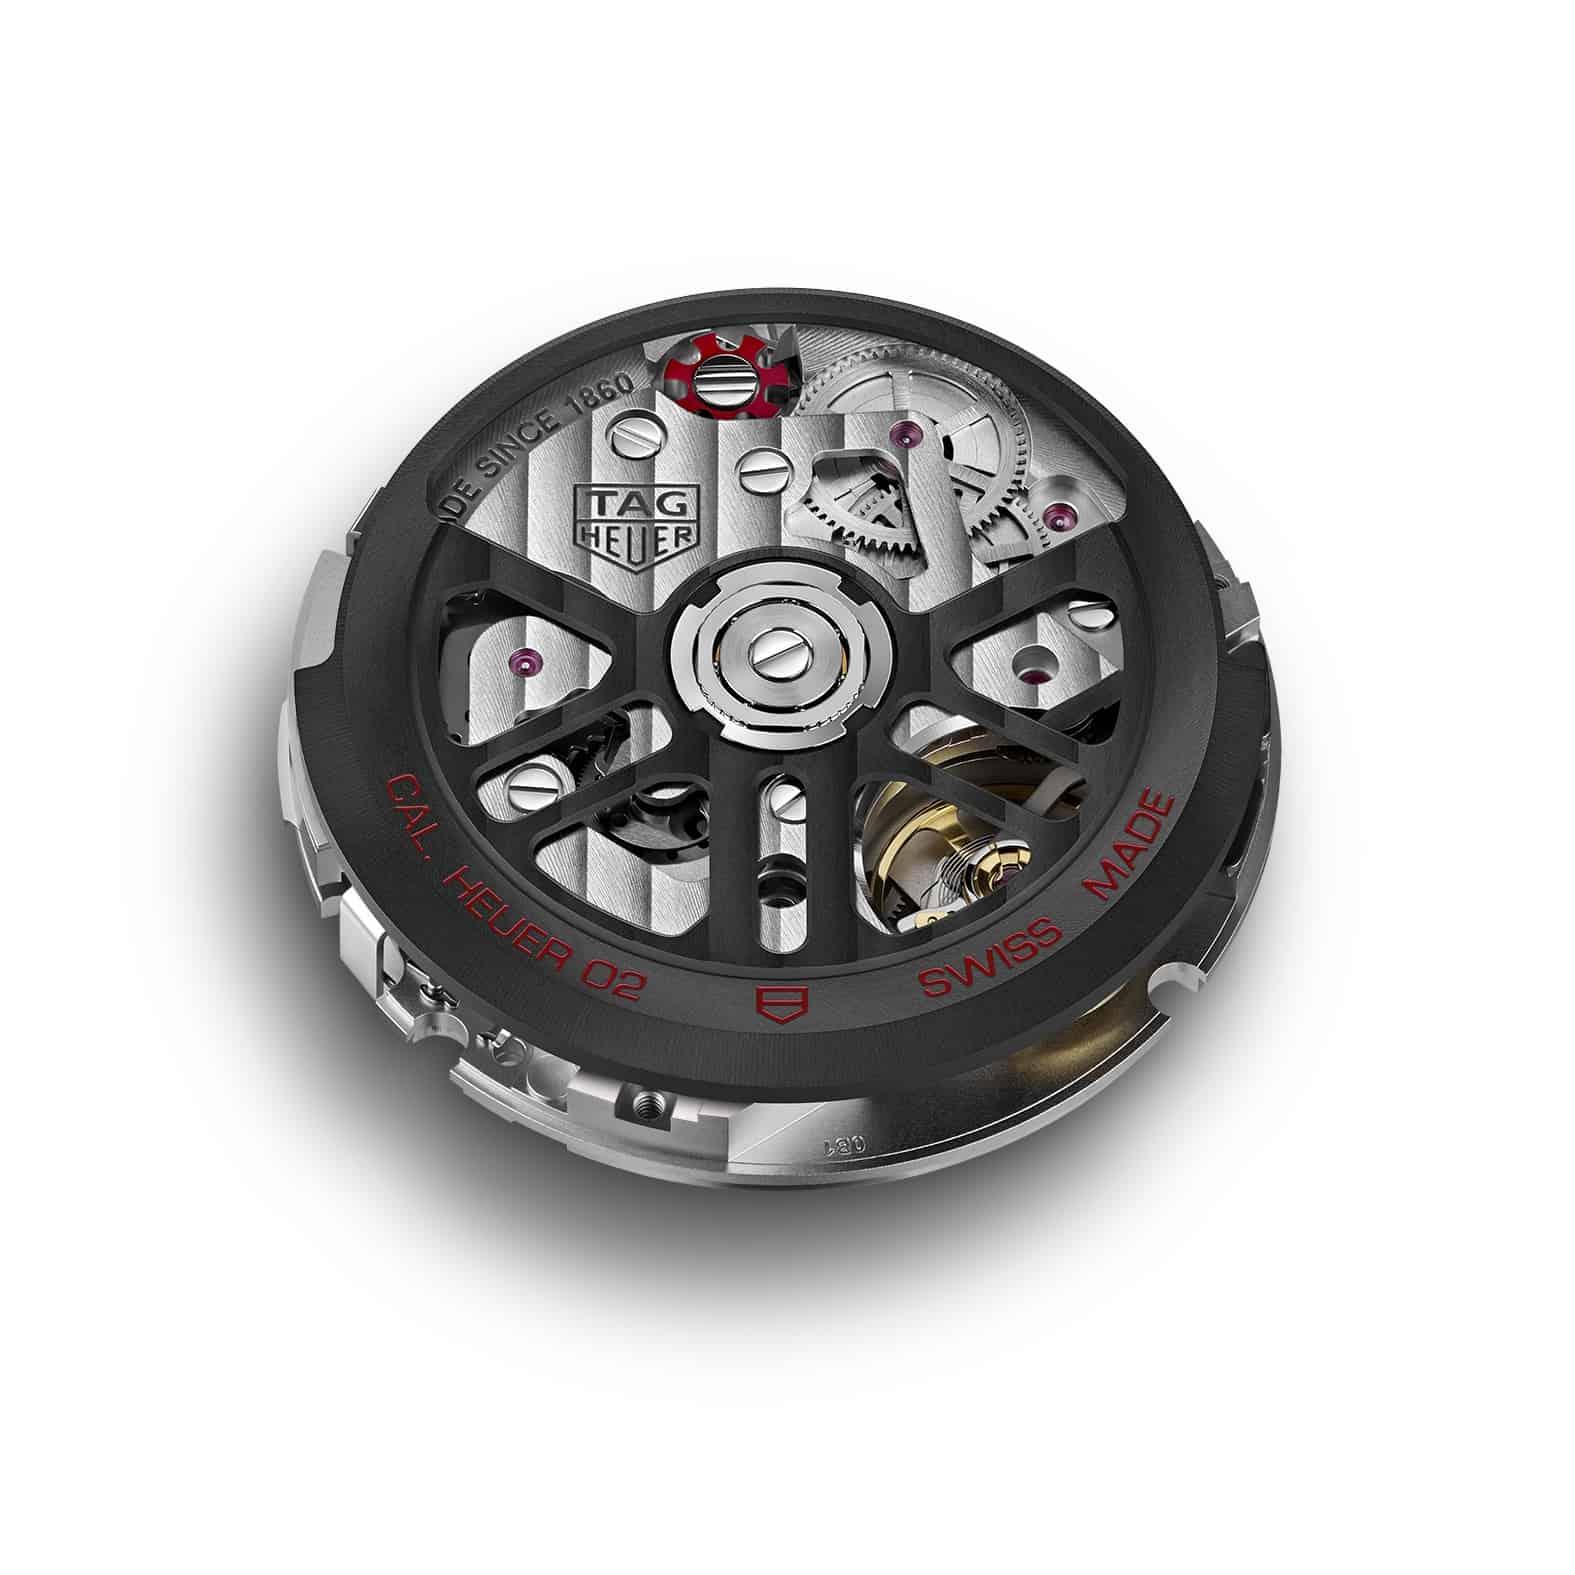 Hypermodernes Automatikkaliber Heuer 02 mit Schaltrad-Chronograph